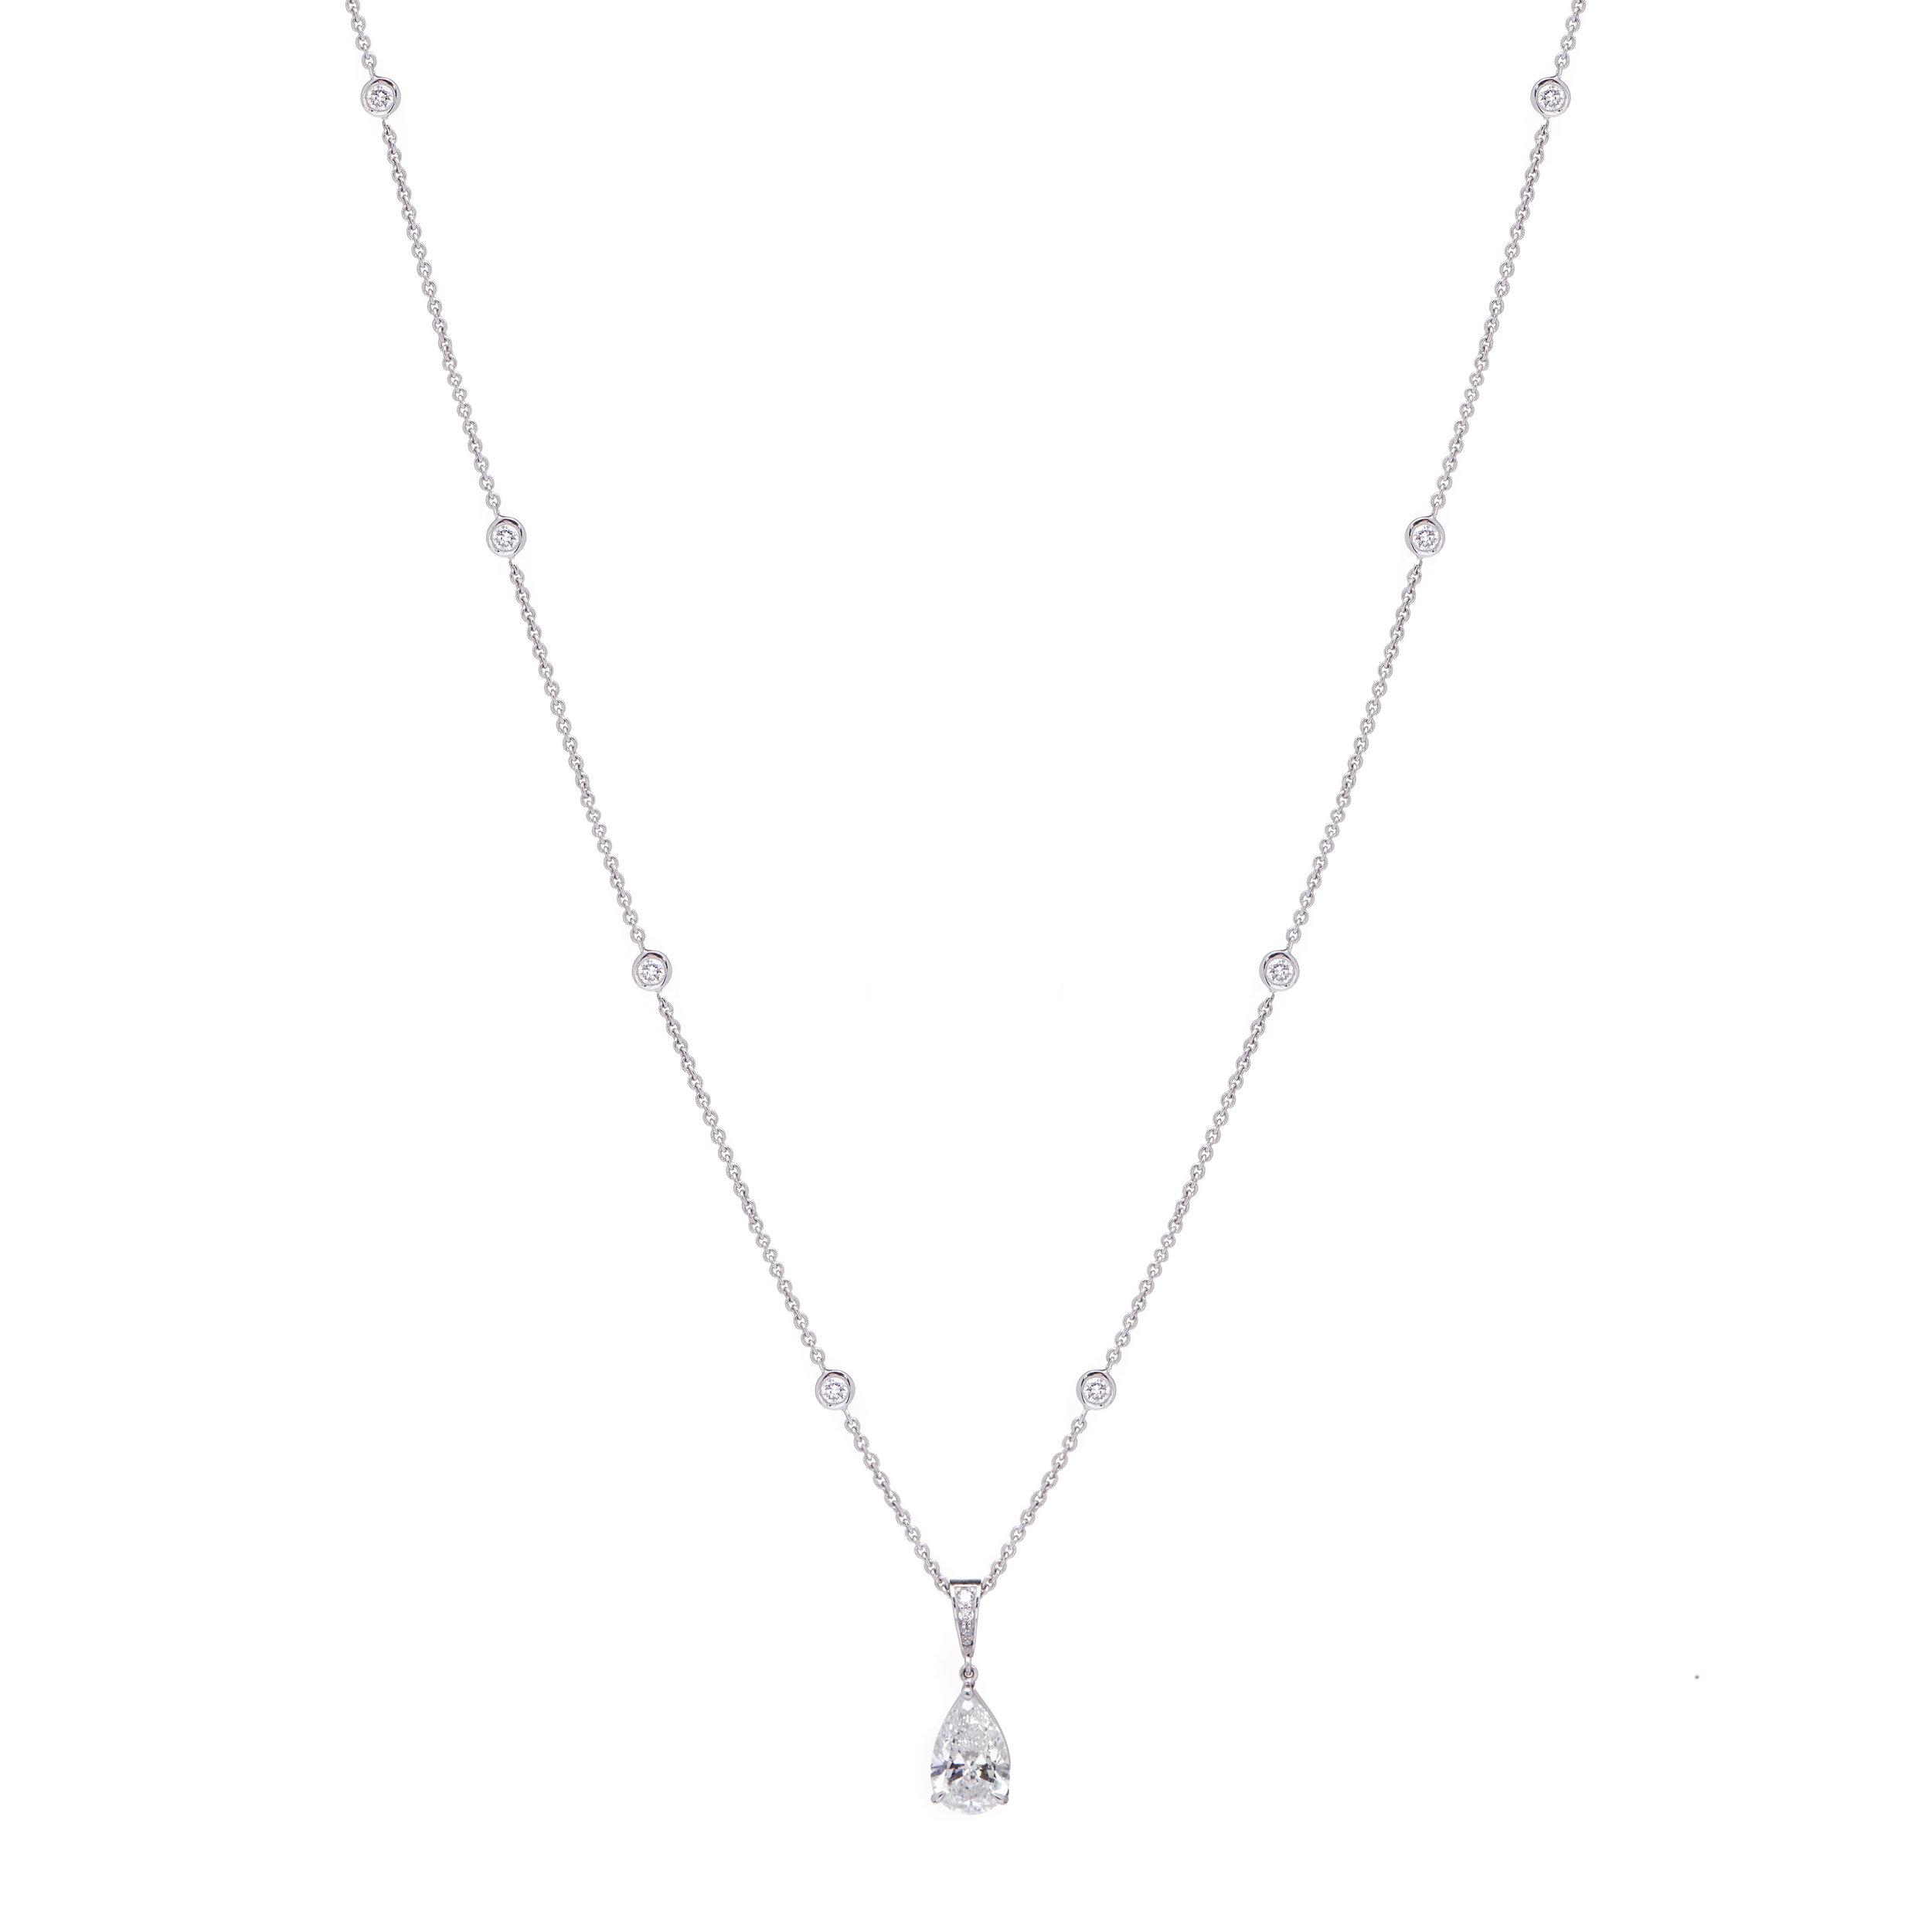 Bespoke Necklace